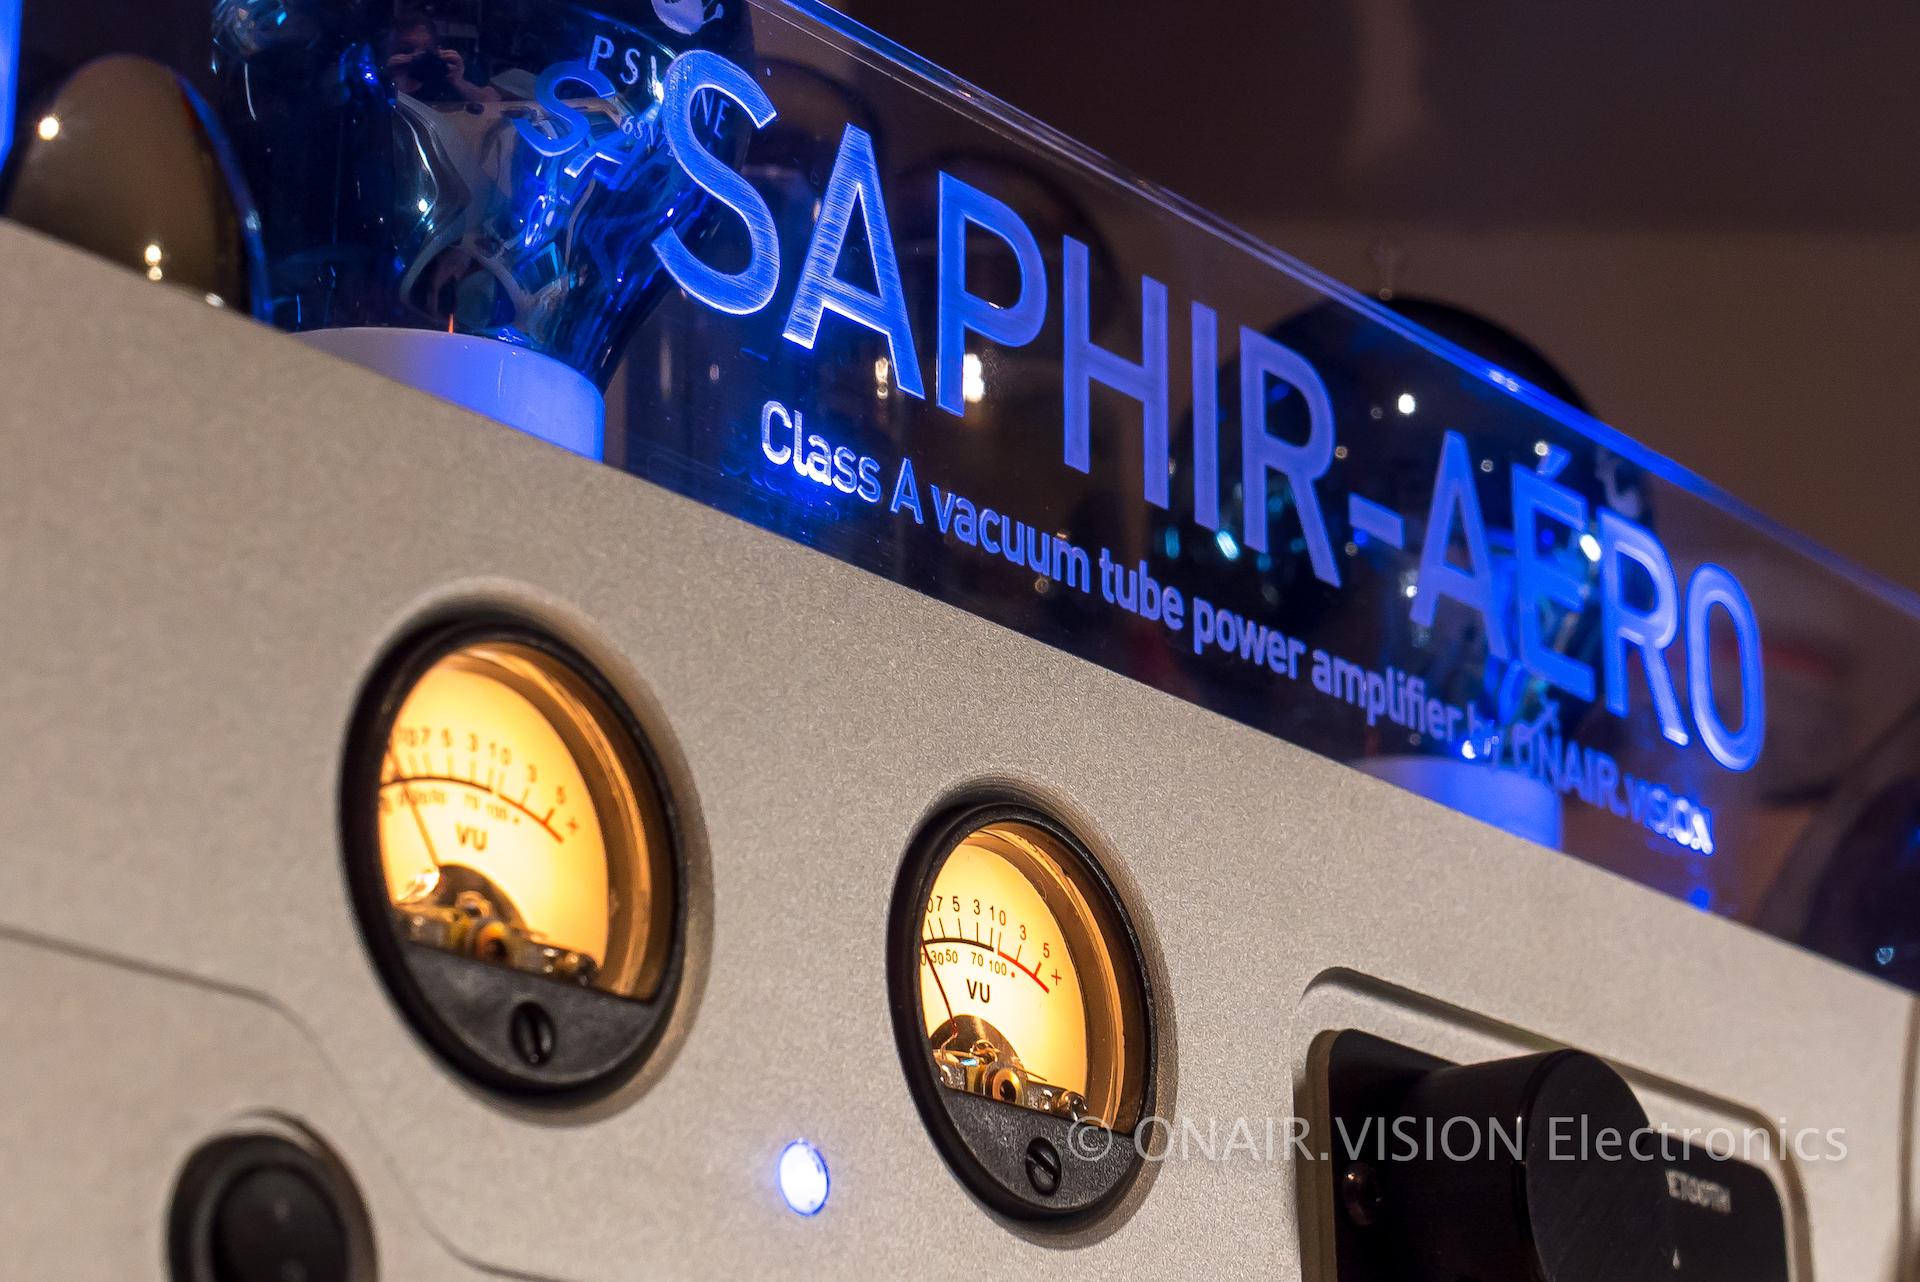 OFFI-SAPHIR-AERO-7249 BR